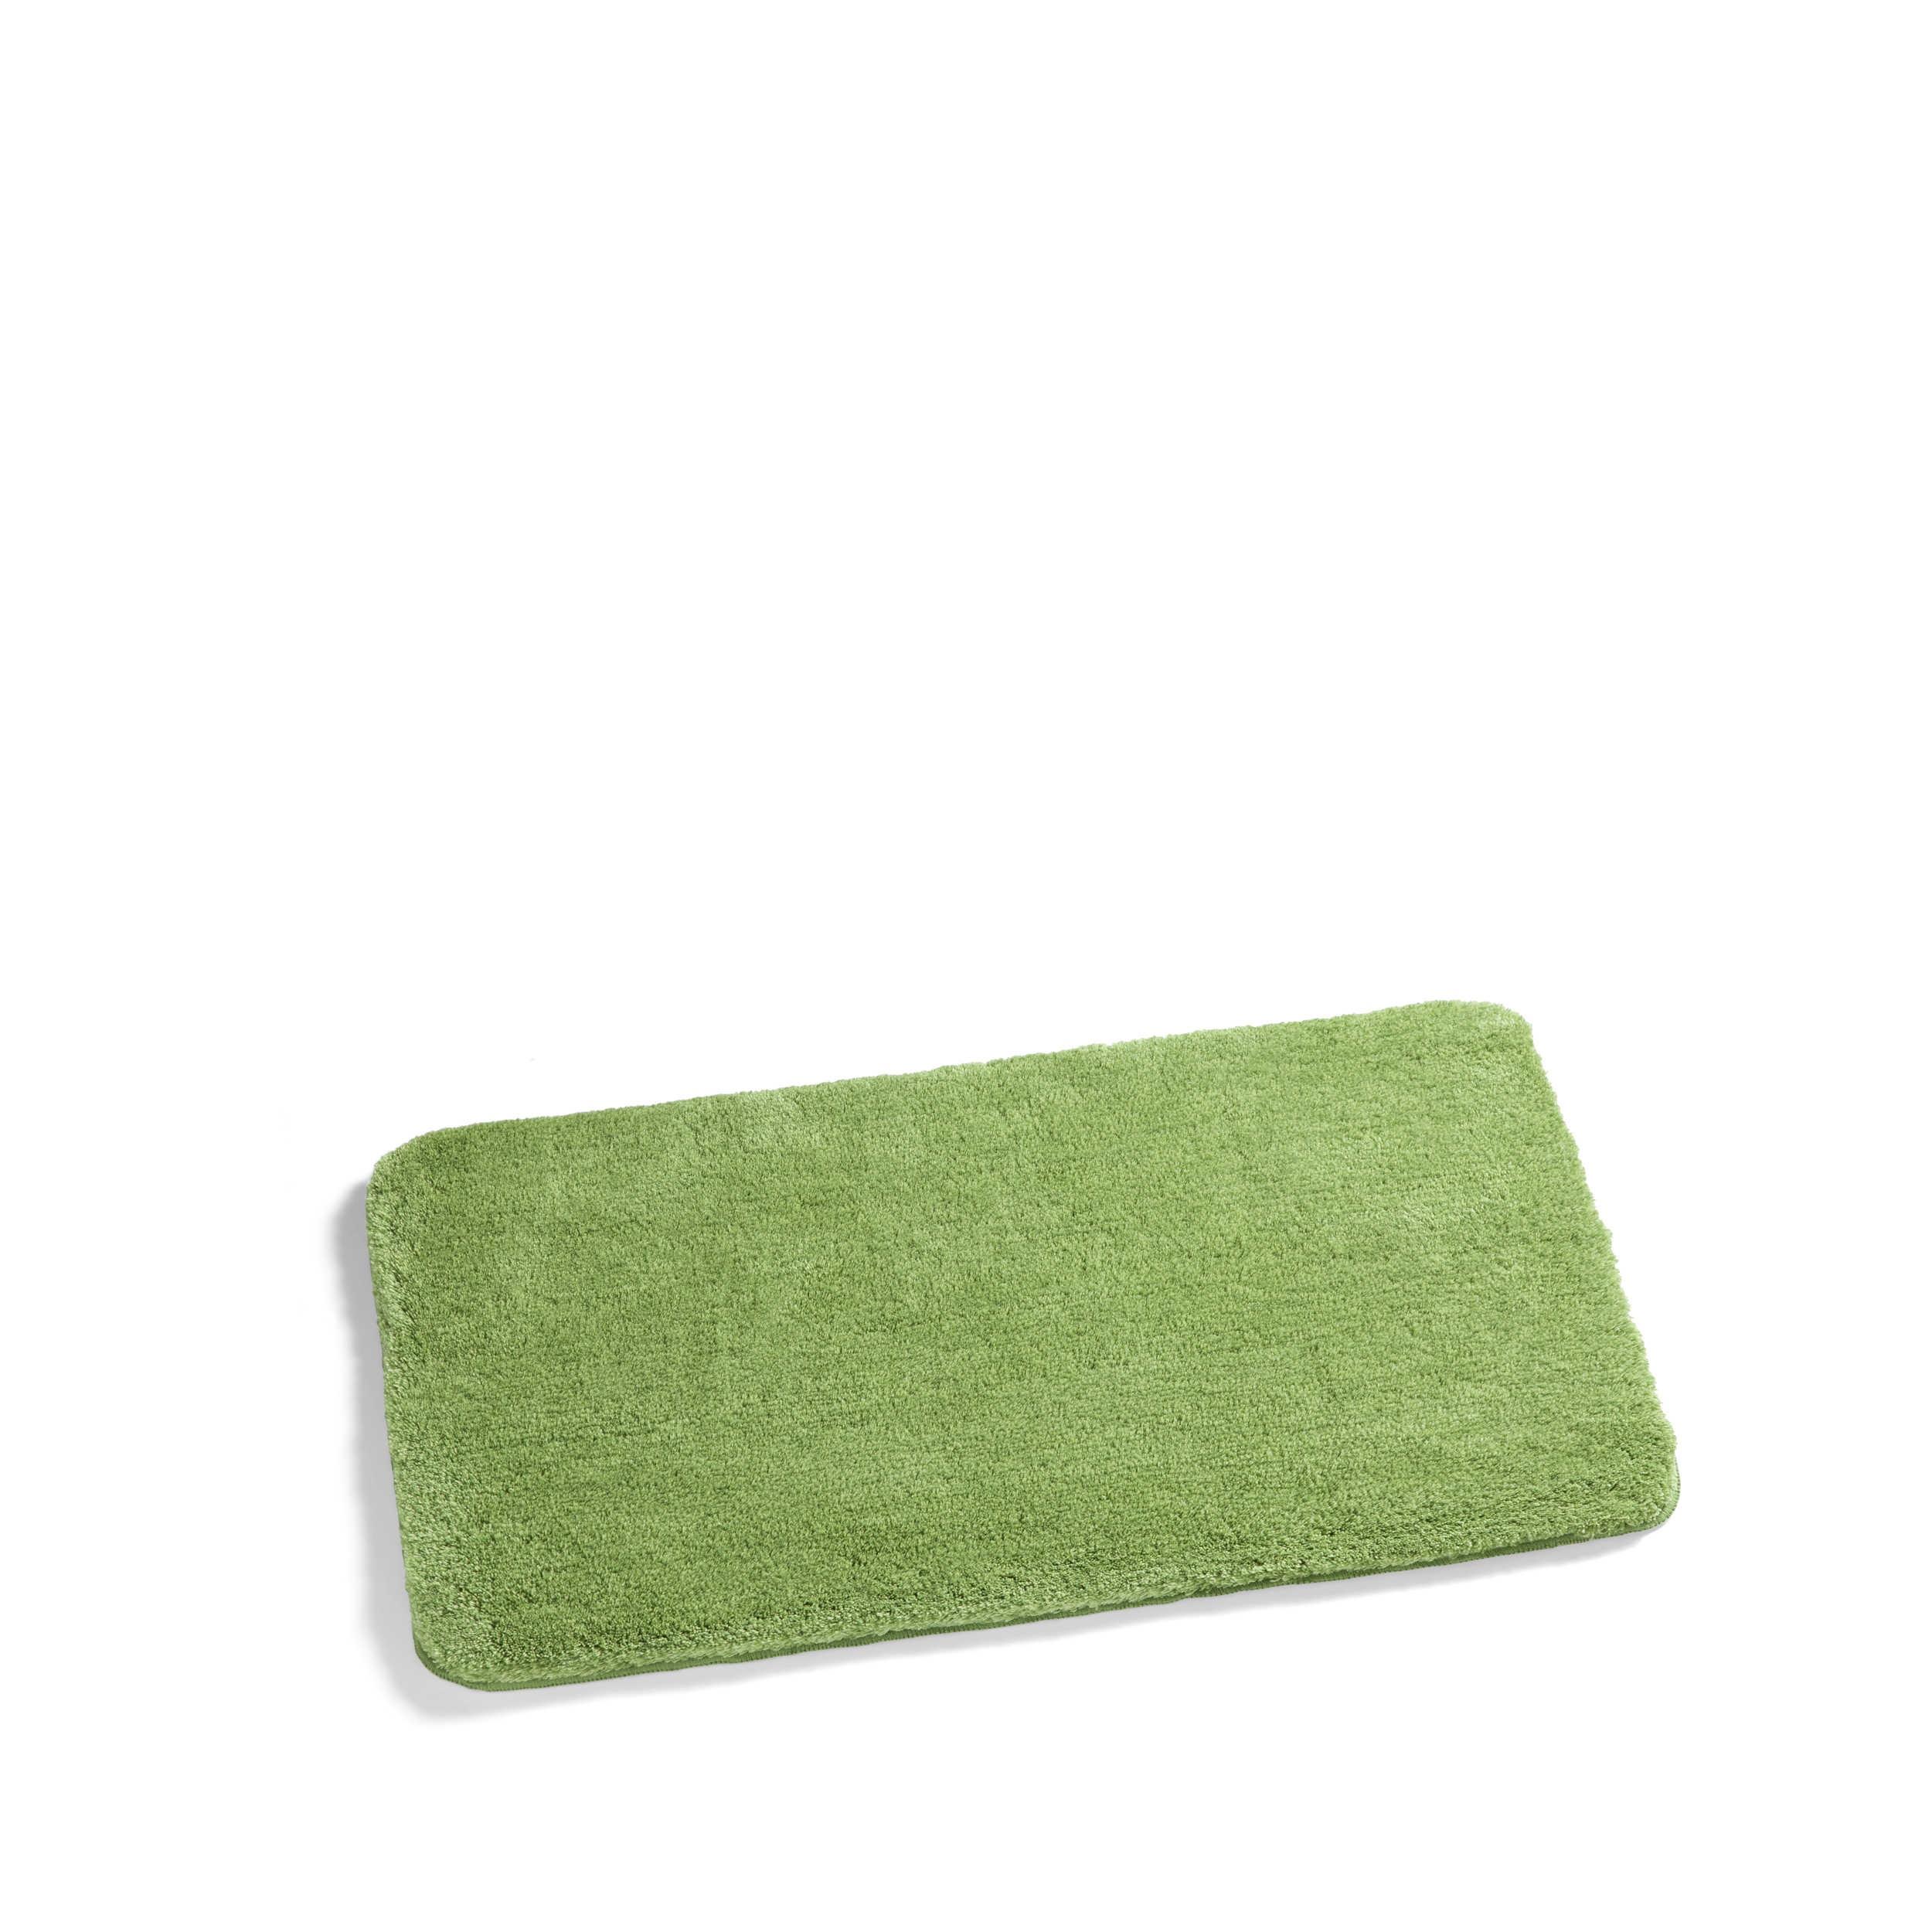 kleine wolke badteppich relax 85 x 150 cm gr n polyacryl. Black Bedroom Furniture Sets. Home Design Ideas